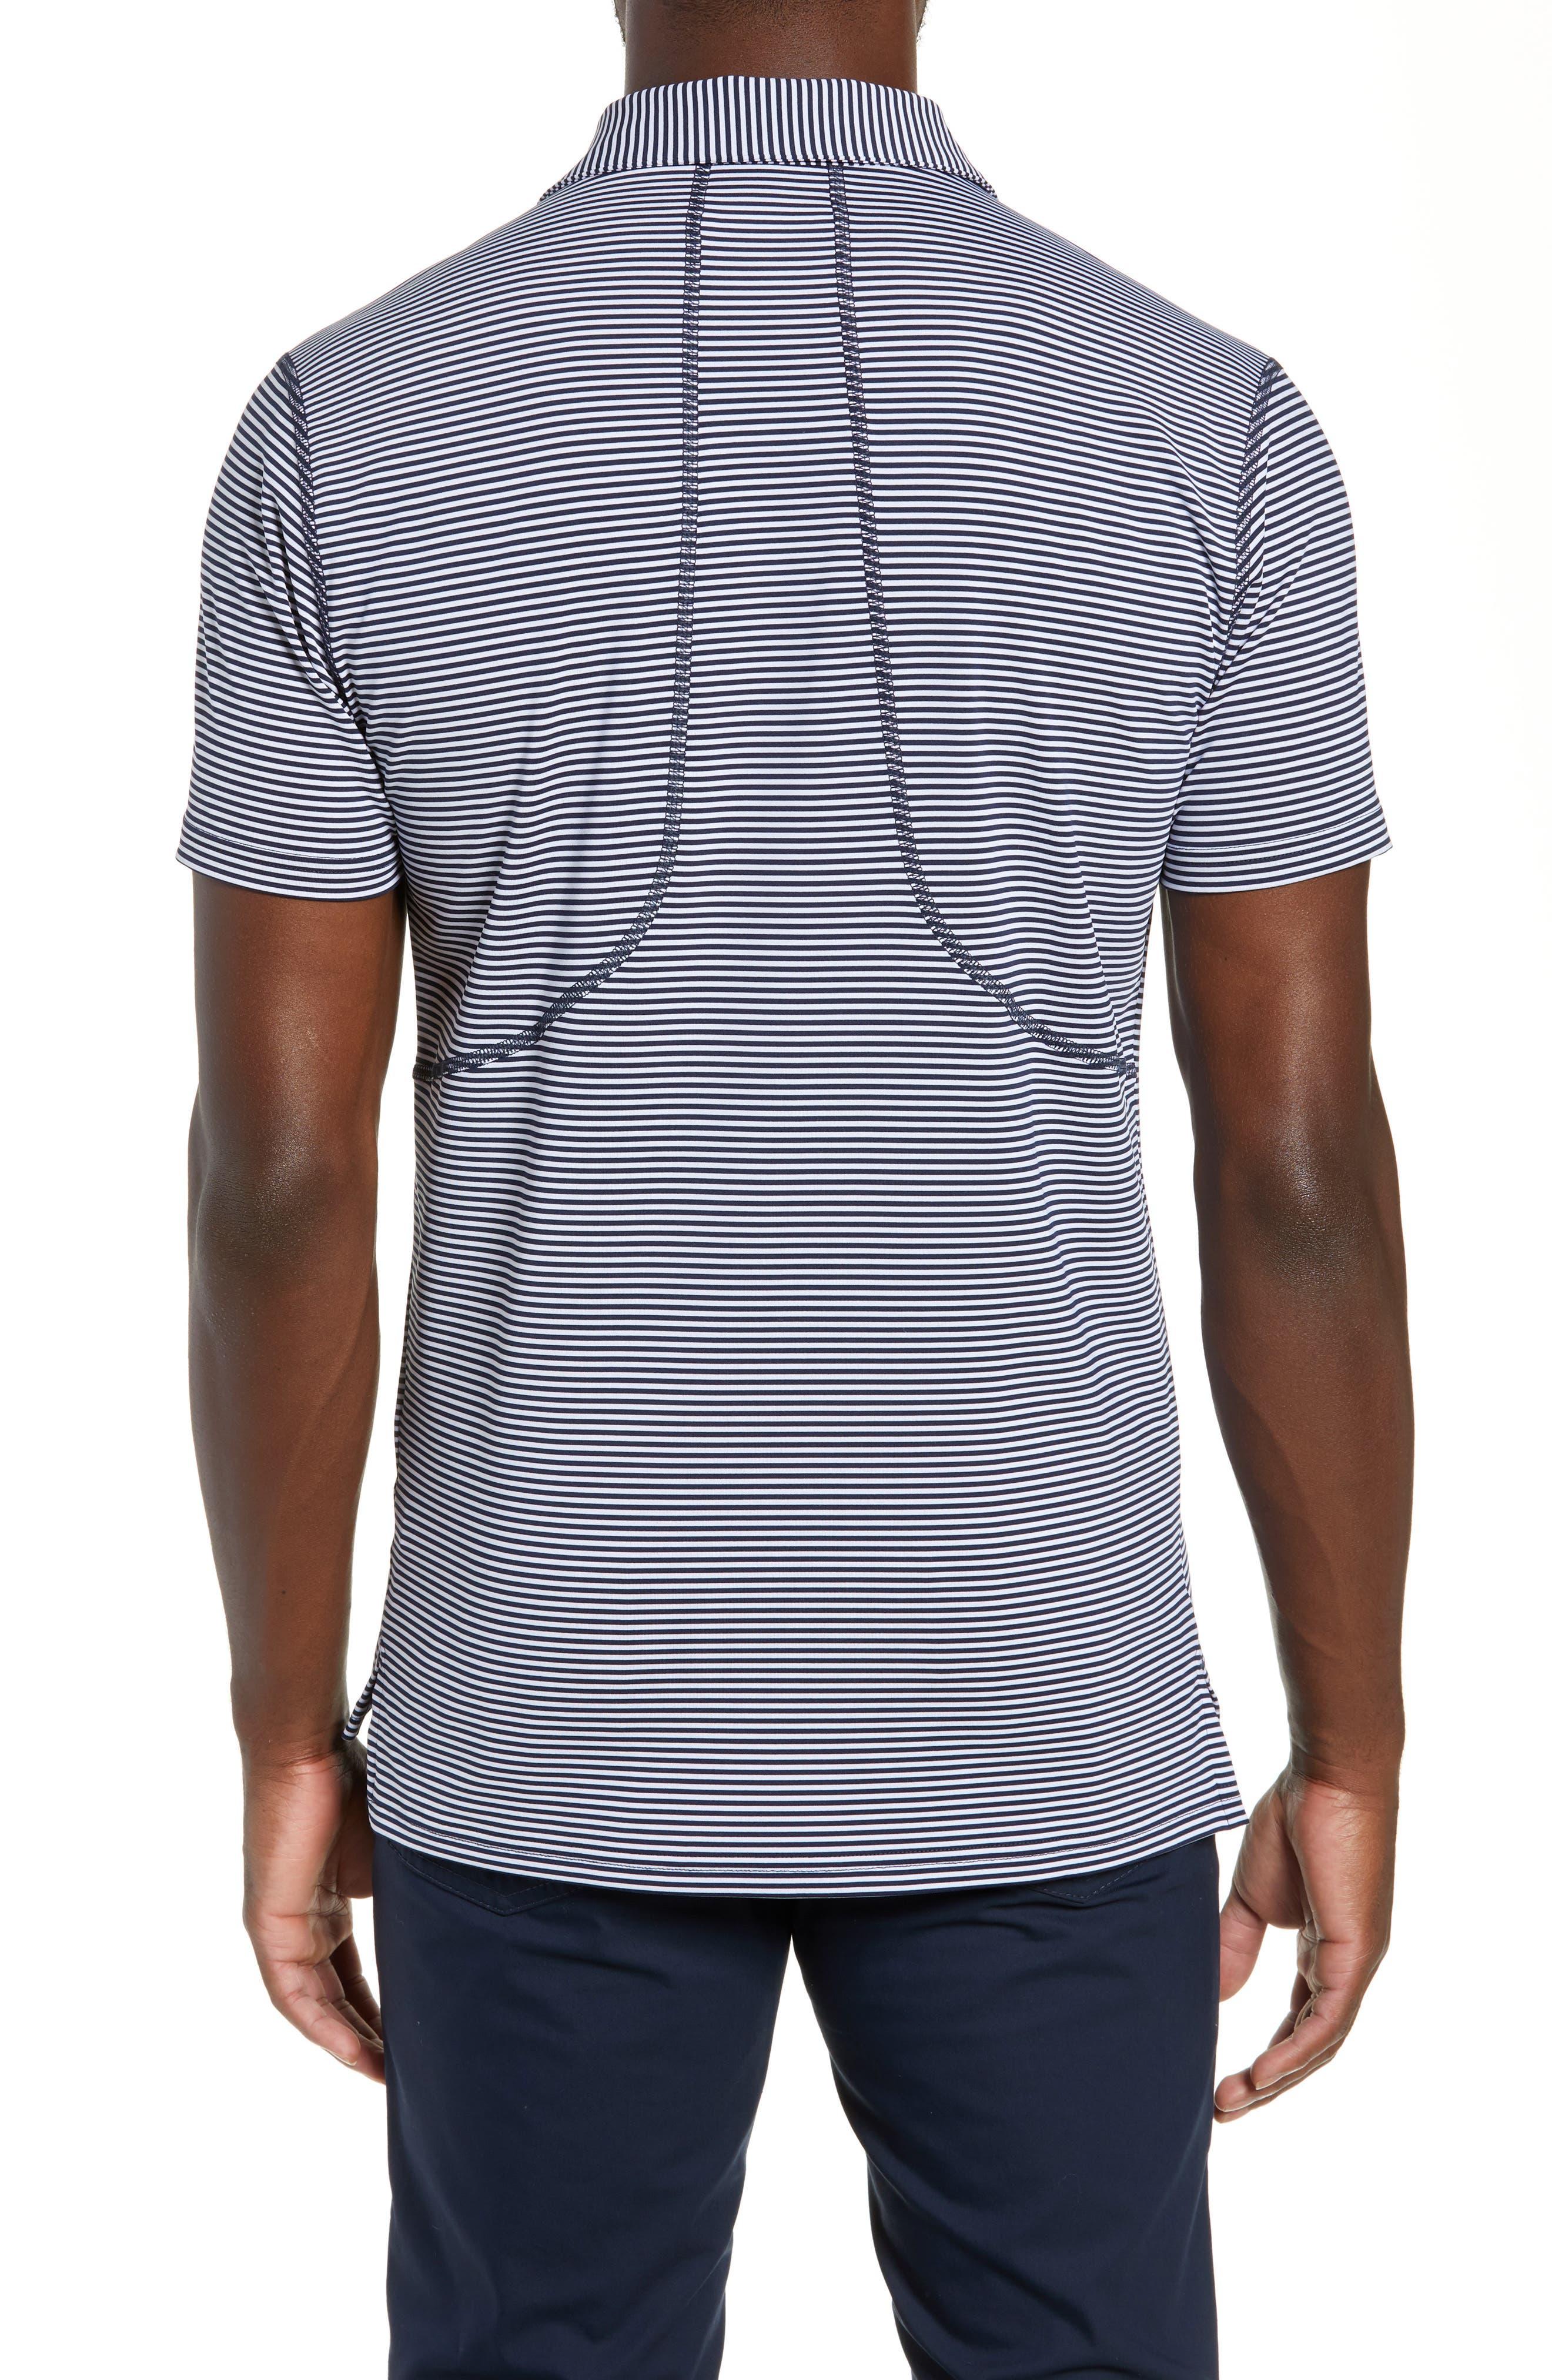 Flatiron Slim Fit Jacquard Jersey Polo,                             Alternate thumbnail 2, color,                             NAVY/ WHITE